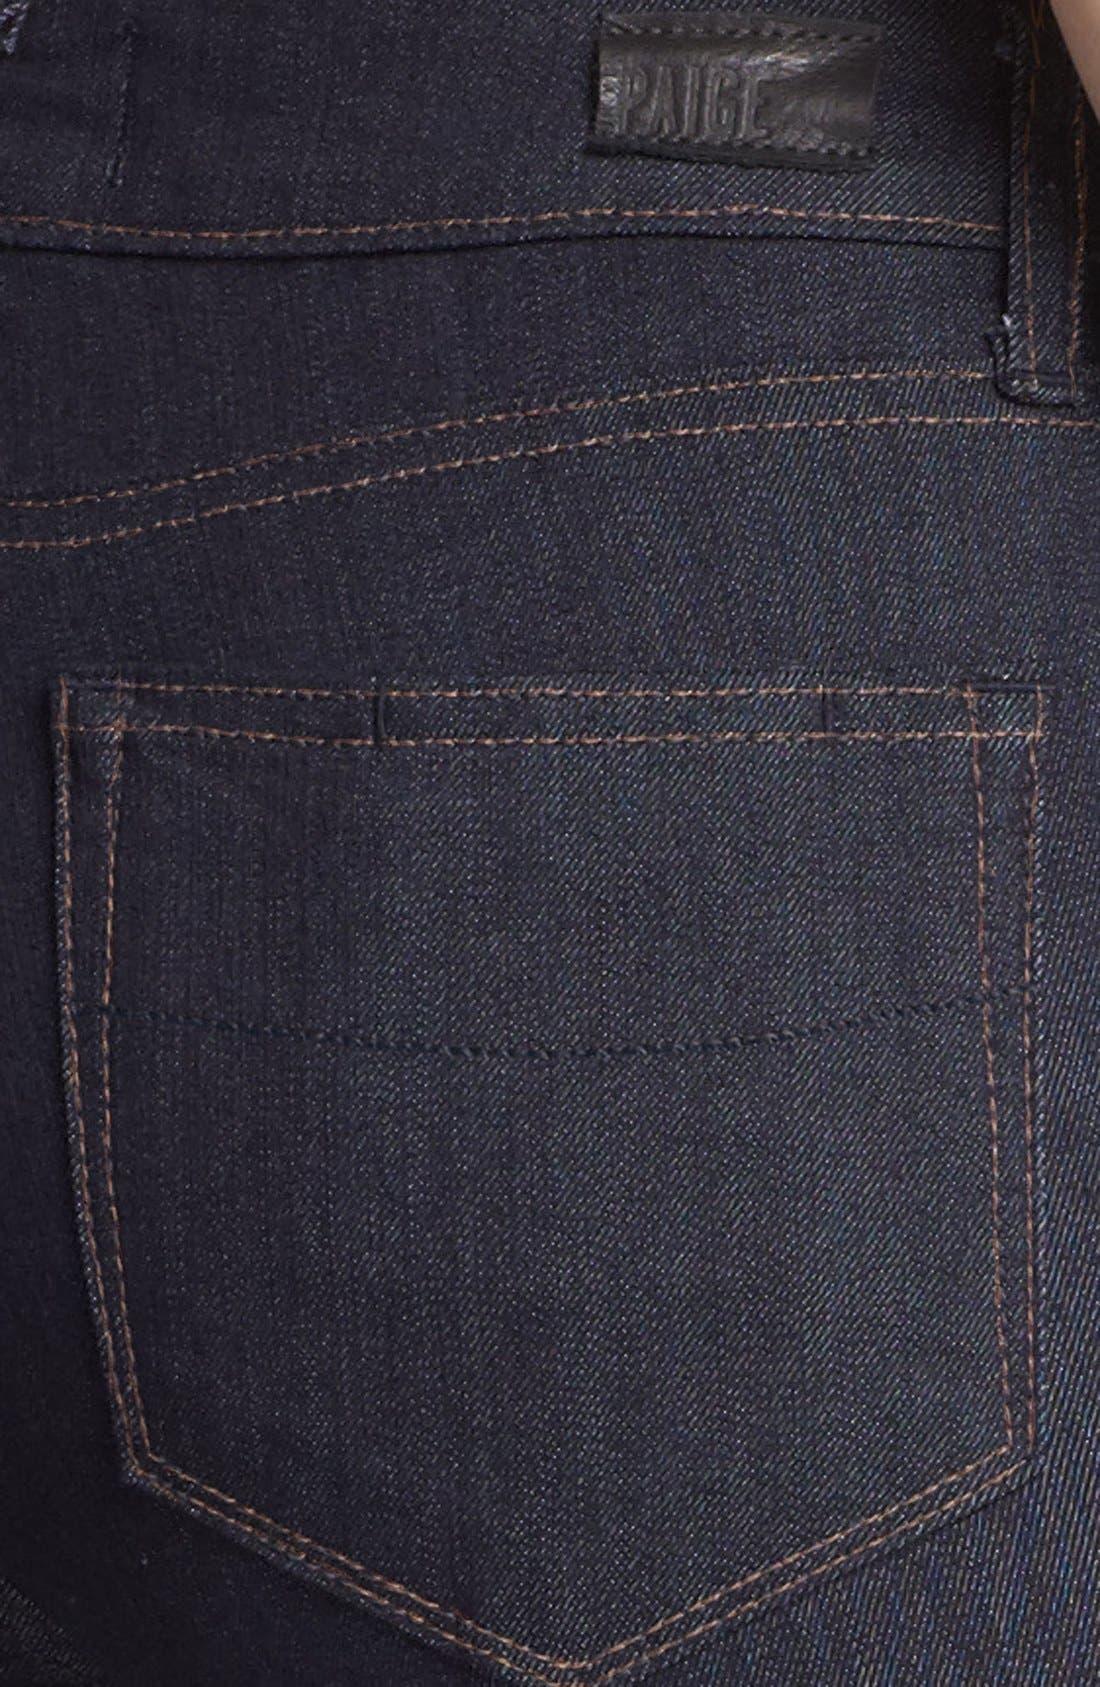 Alternate Image 3  - Paige Denim 'Manhattan' Baby Bootcut Jeans (Elyse)